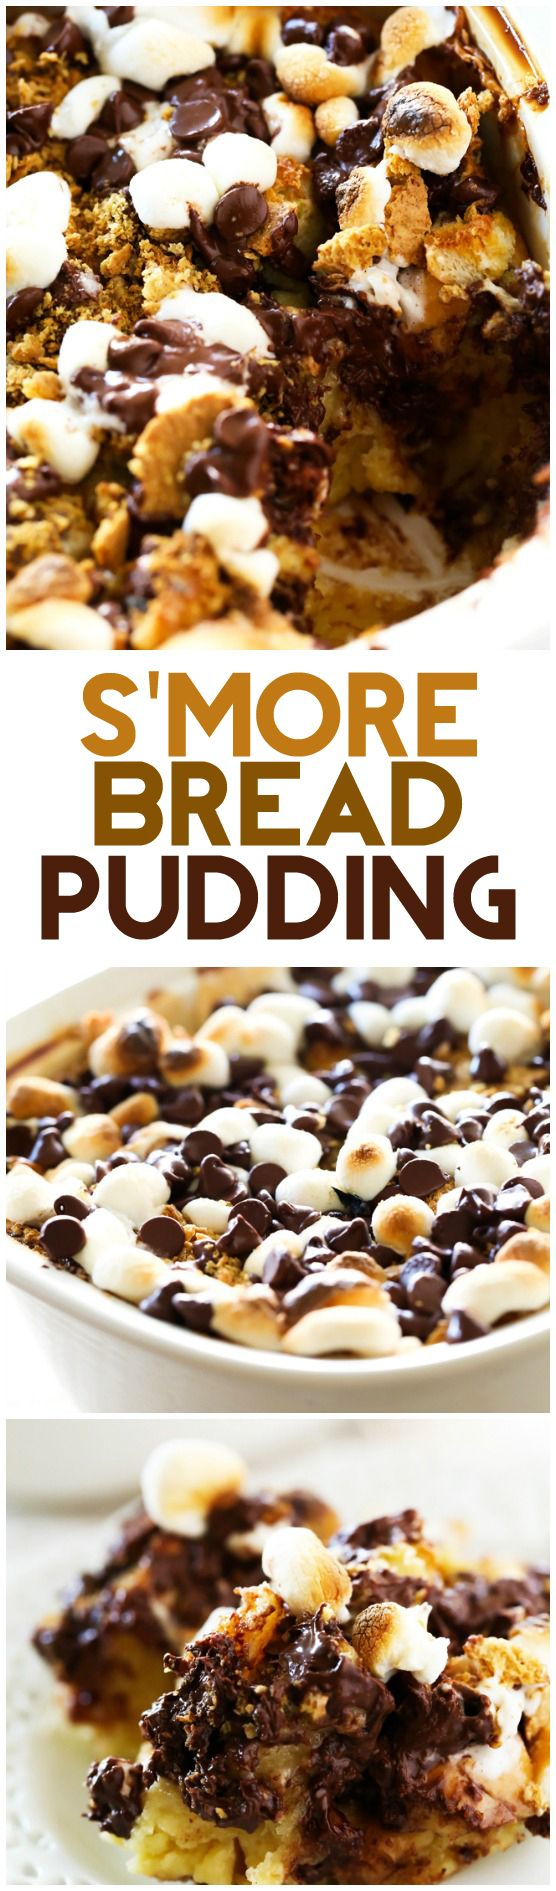 ... Challah bread pudding, White chocolate bread pudding and Custard bread